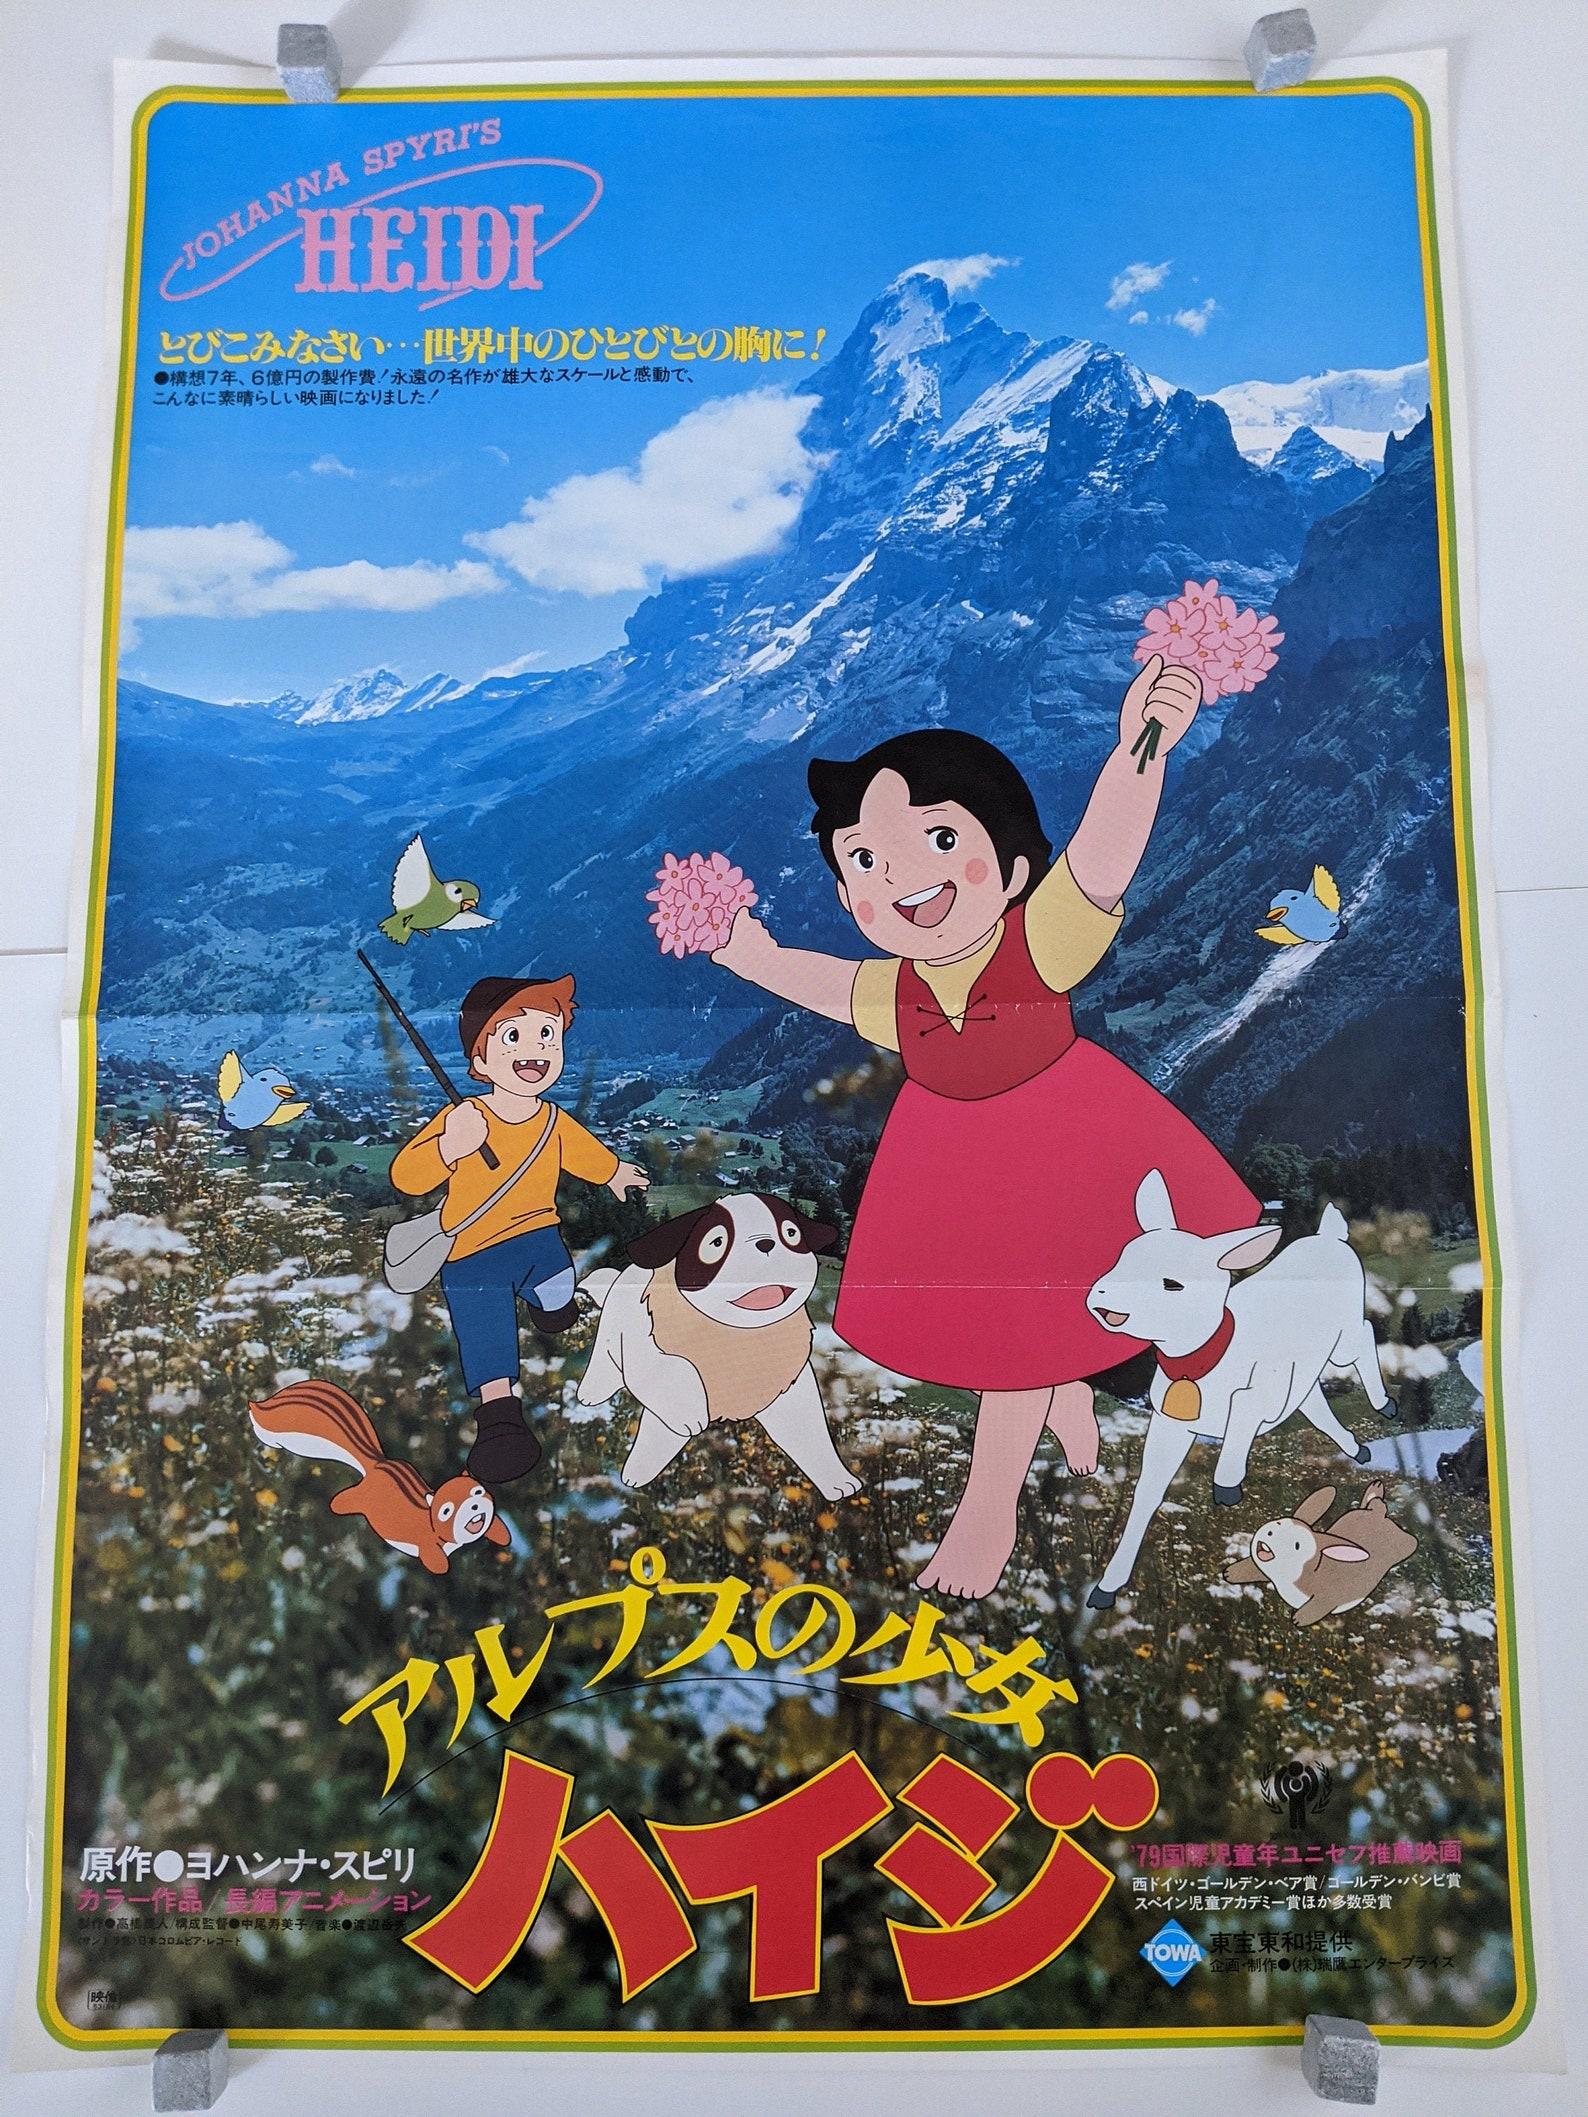 Heidi, Girl of the Alps (1979) Japanese Movie Poster